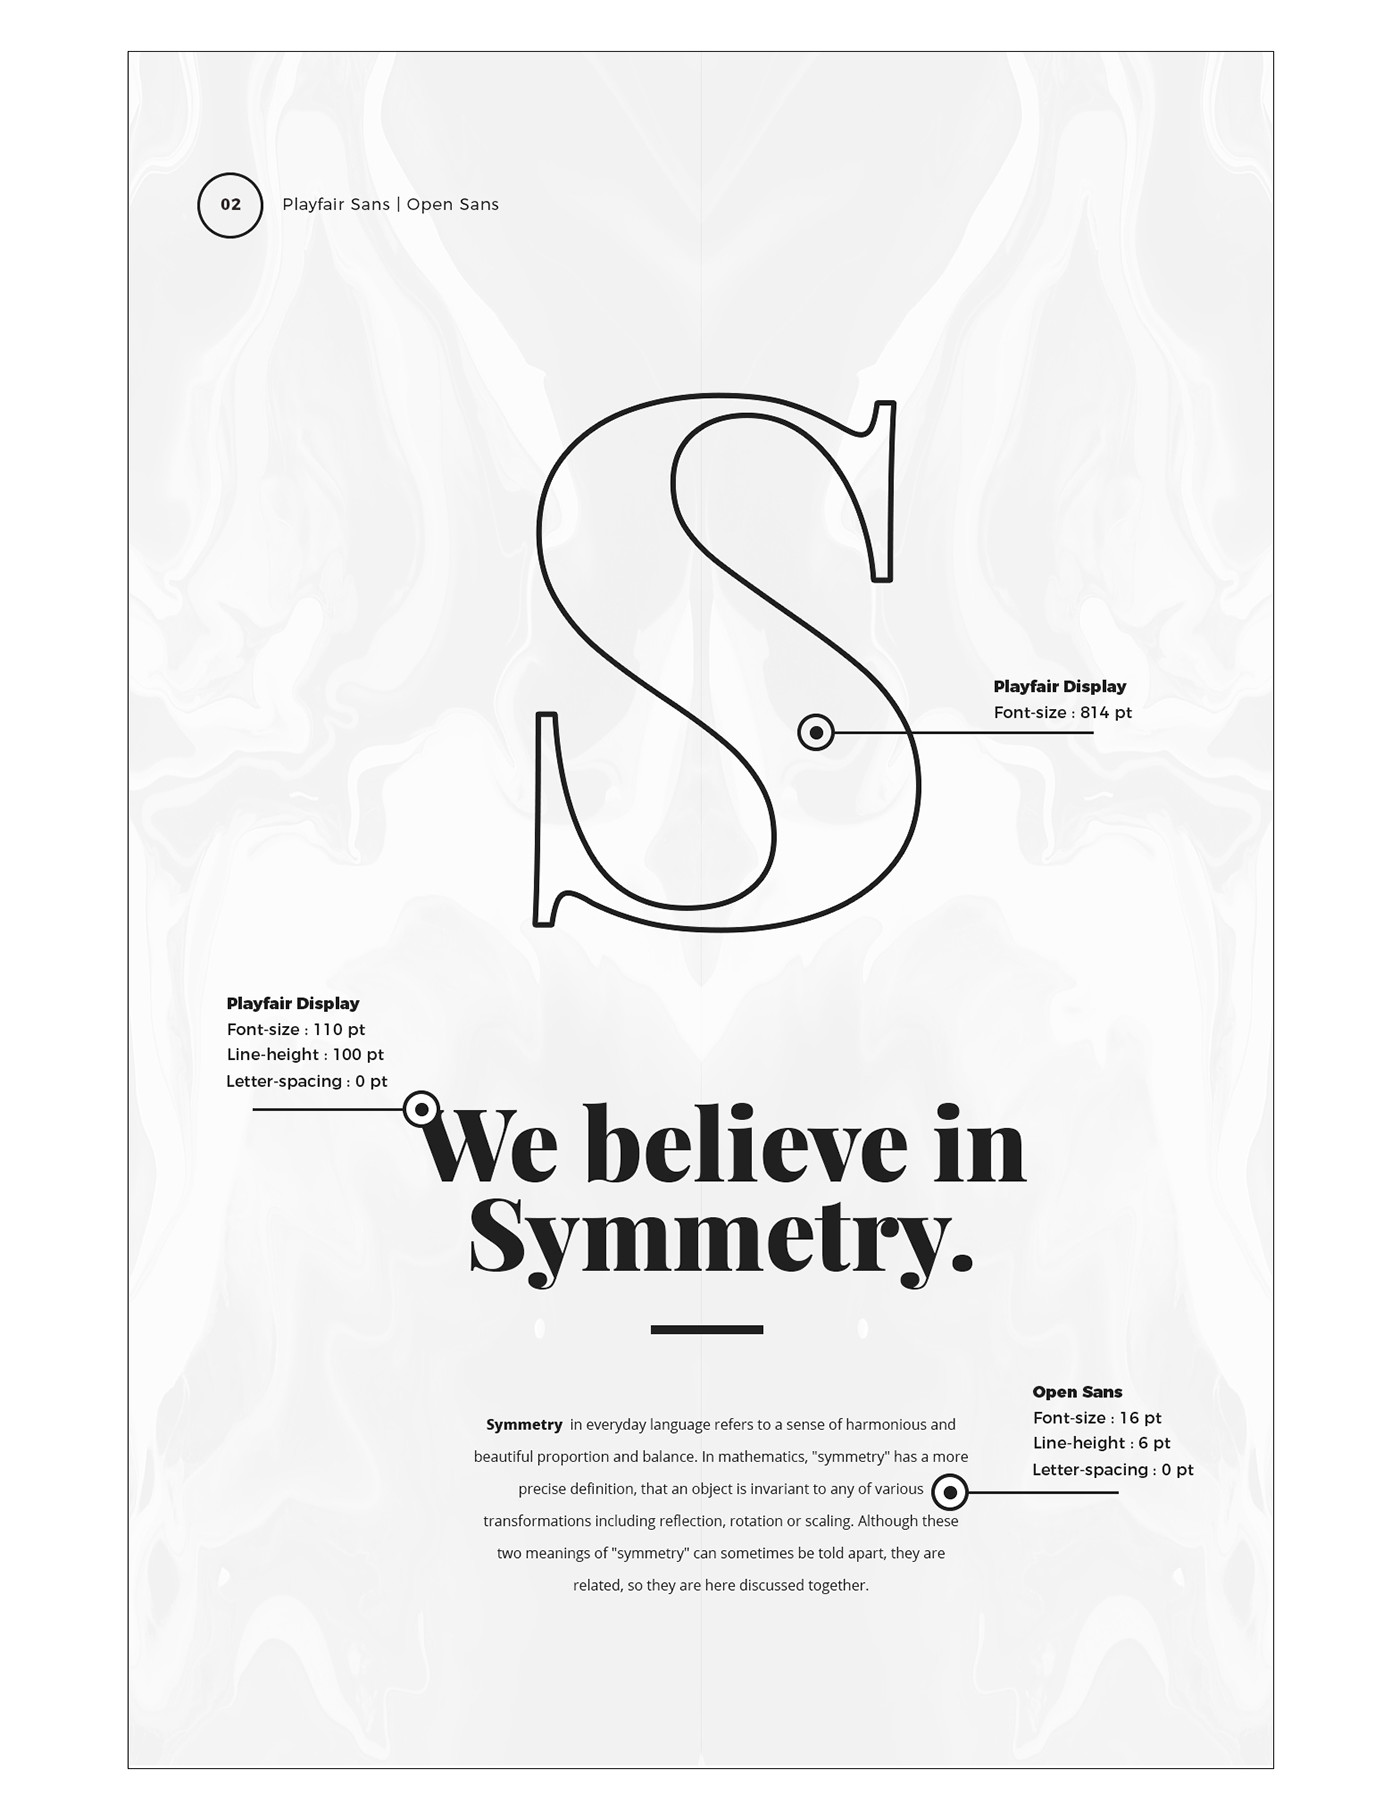 Tendências de Google Fonts 2017 Simetria b